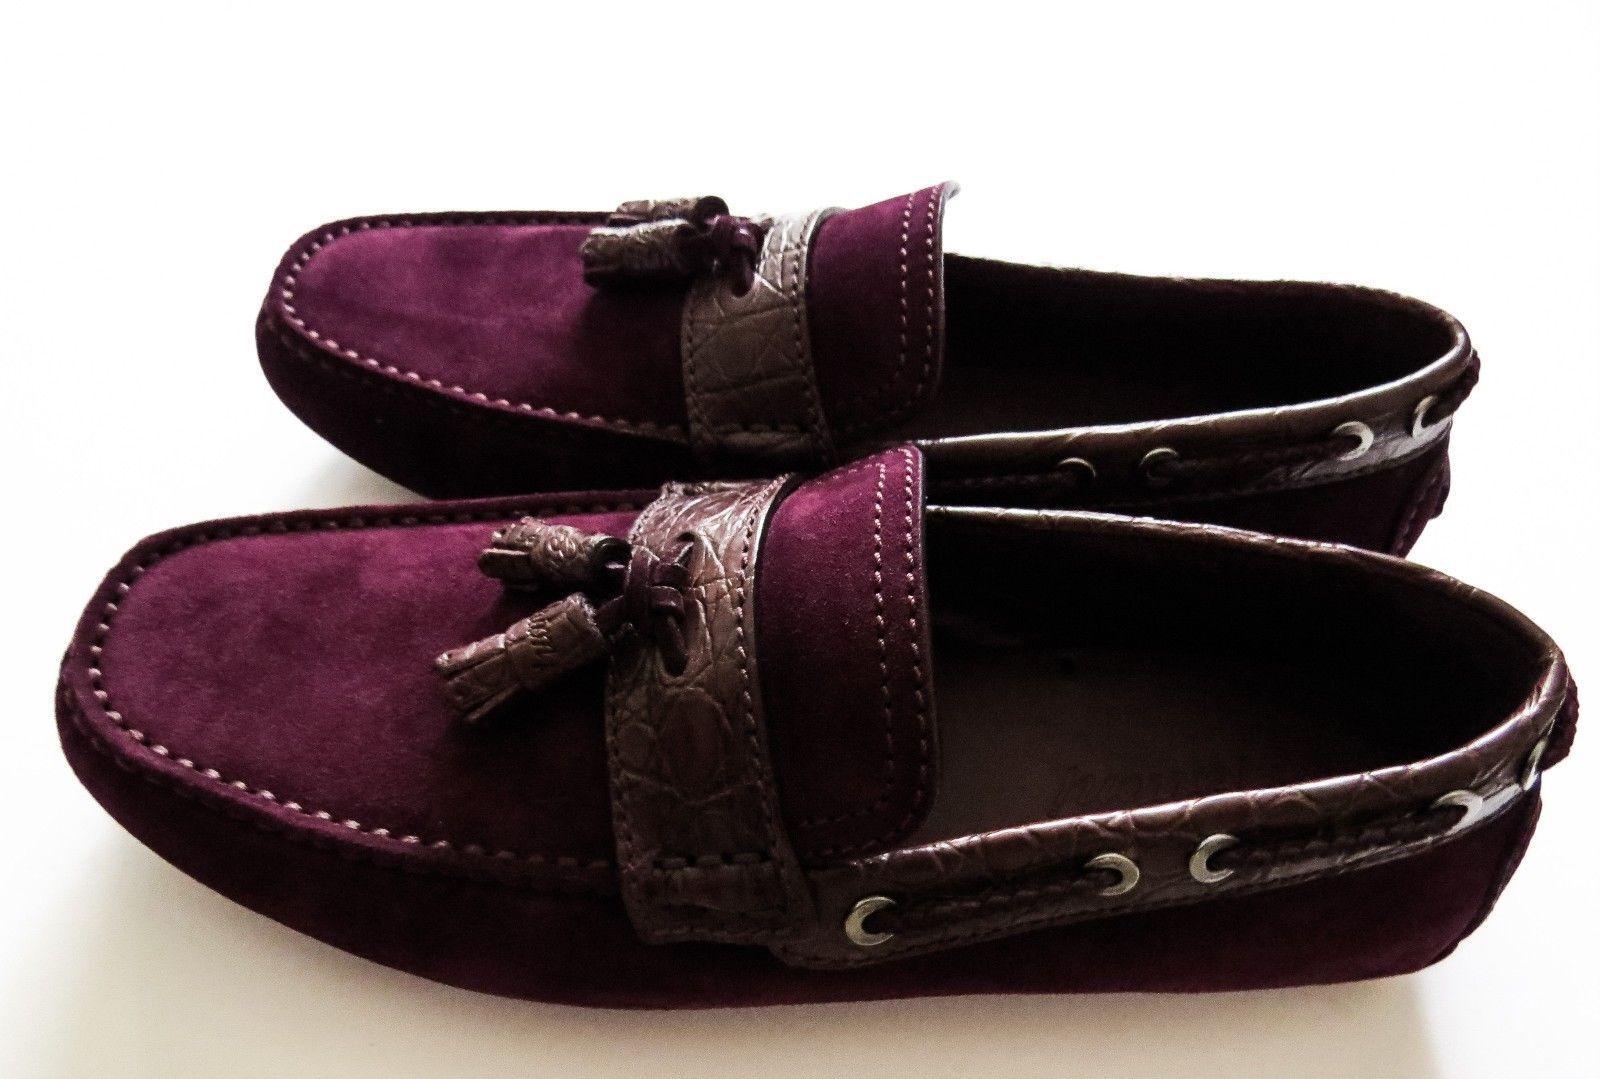 1075 BRIONI Suede Crocodile Leather Tassel Shoes Loafers 8.5 US 41.5 EU 7.5 UK